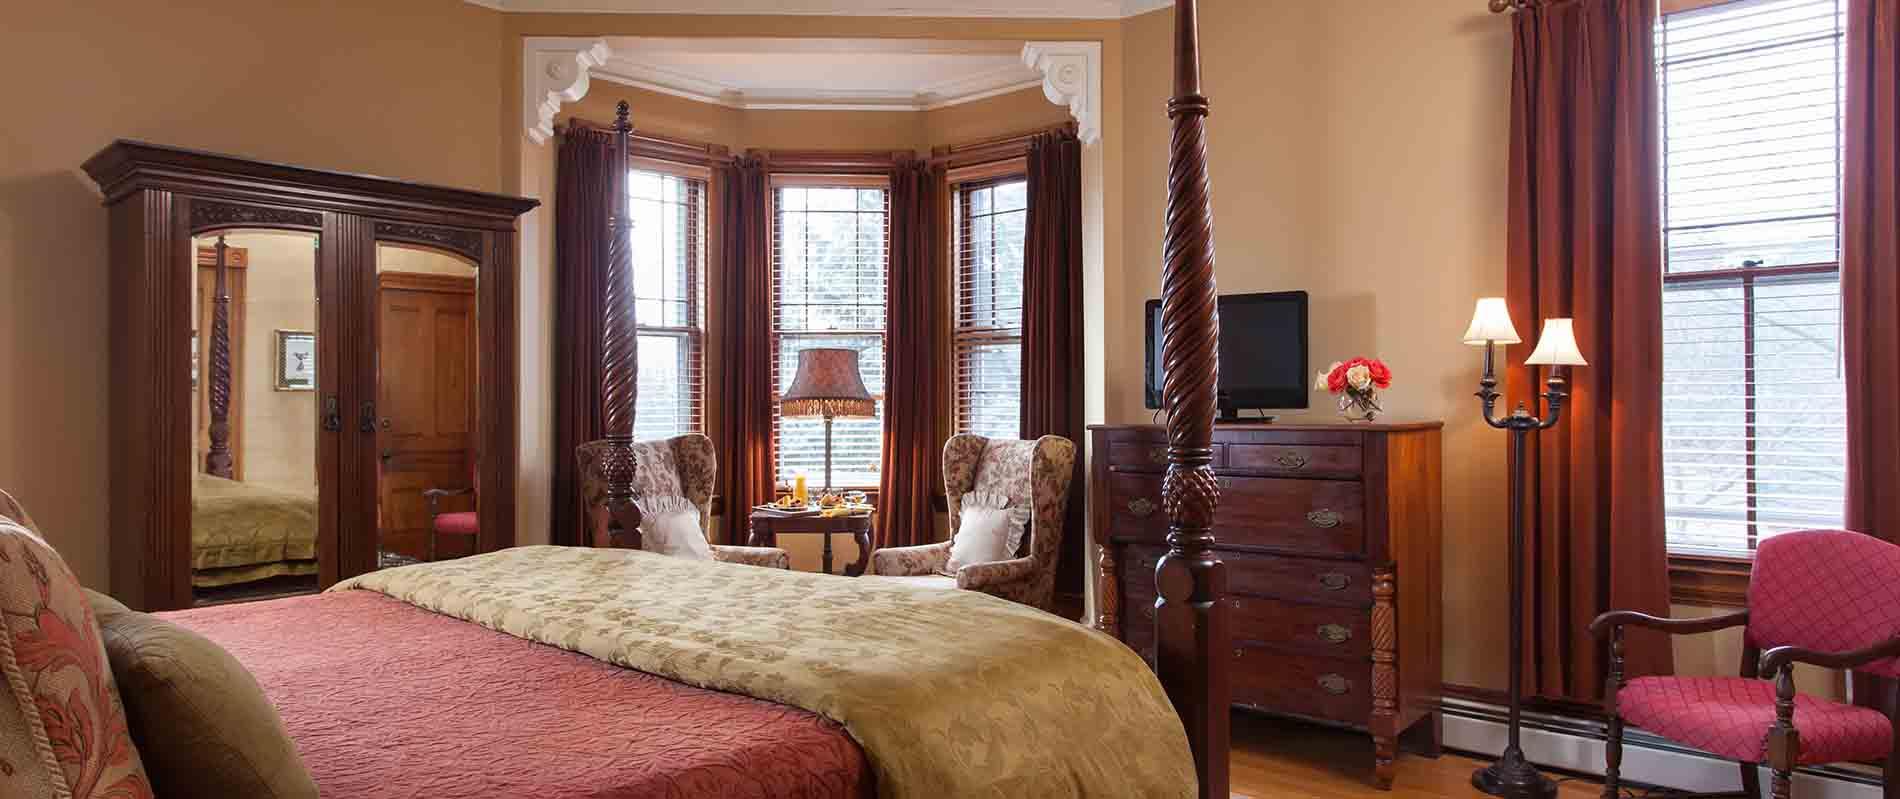 burlington vermont bed and breakfast top rated b u0026b